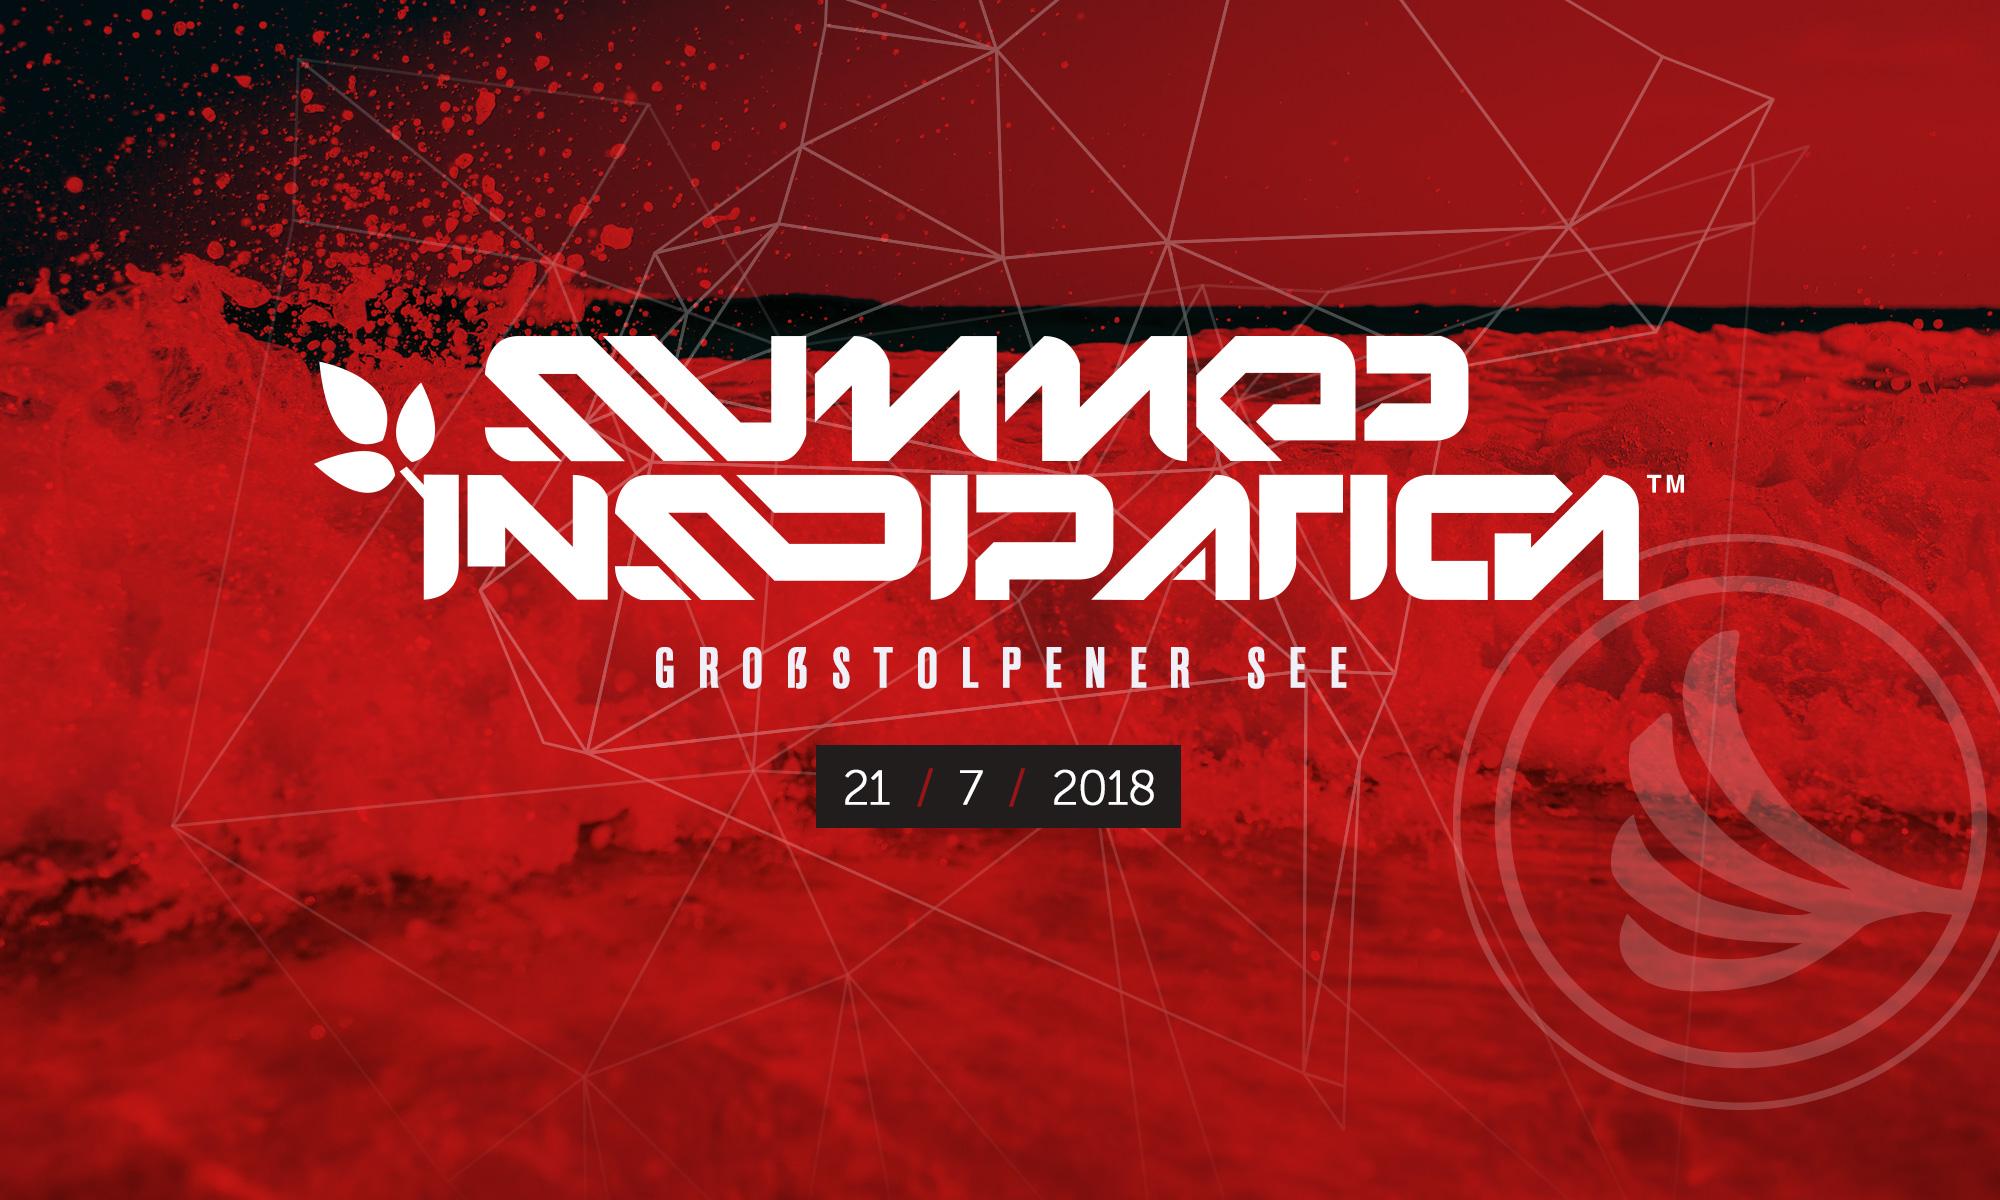 Summer Inspiration 2018 am 21. Juli 2018 in Großstolpen